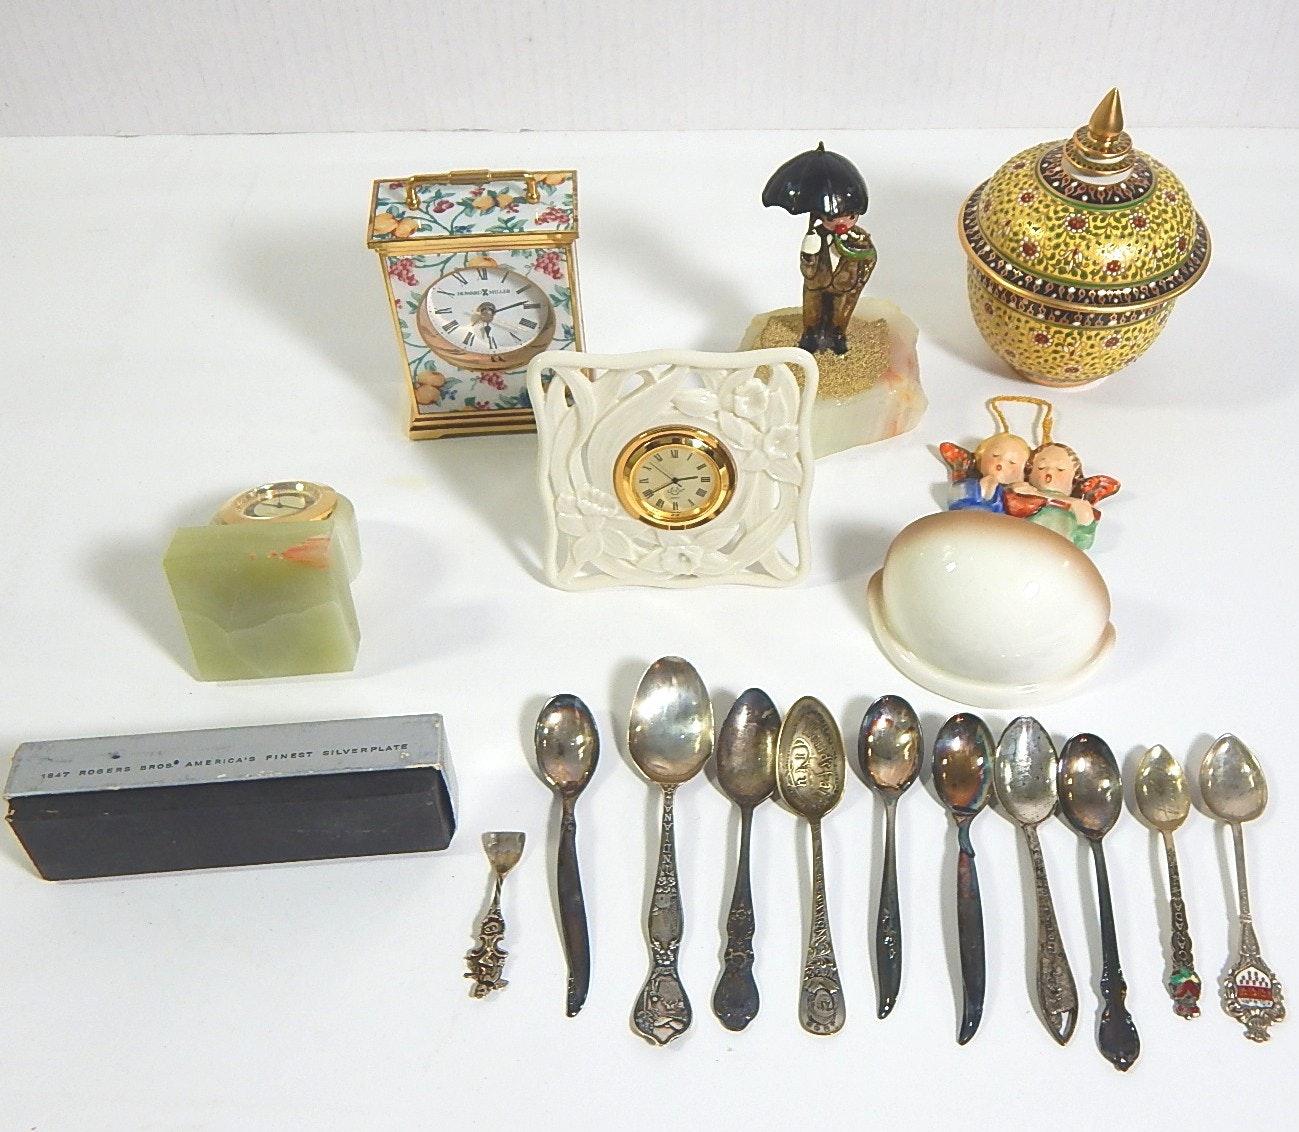 Decorative Housewares with Spoons, Clocks, Figurine and Goebel Hummel Font